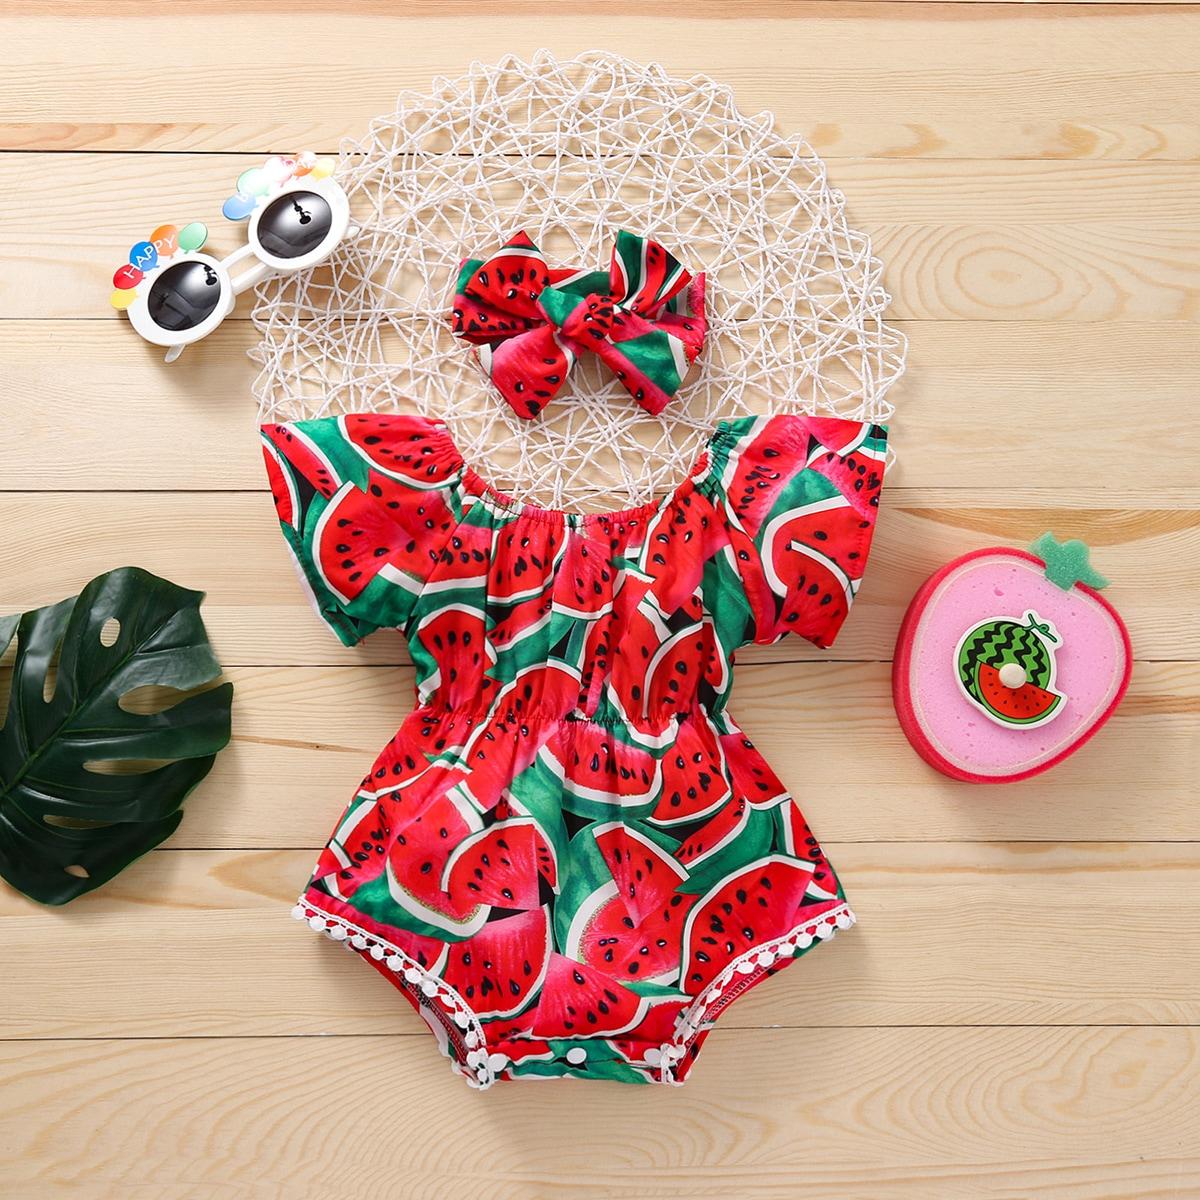 Baby Girl Watermelon Print Bodysuit With Headband, SHEIN  - buy with discount